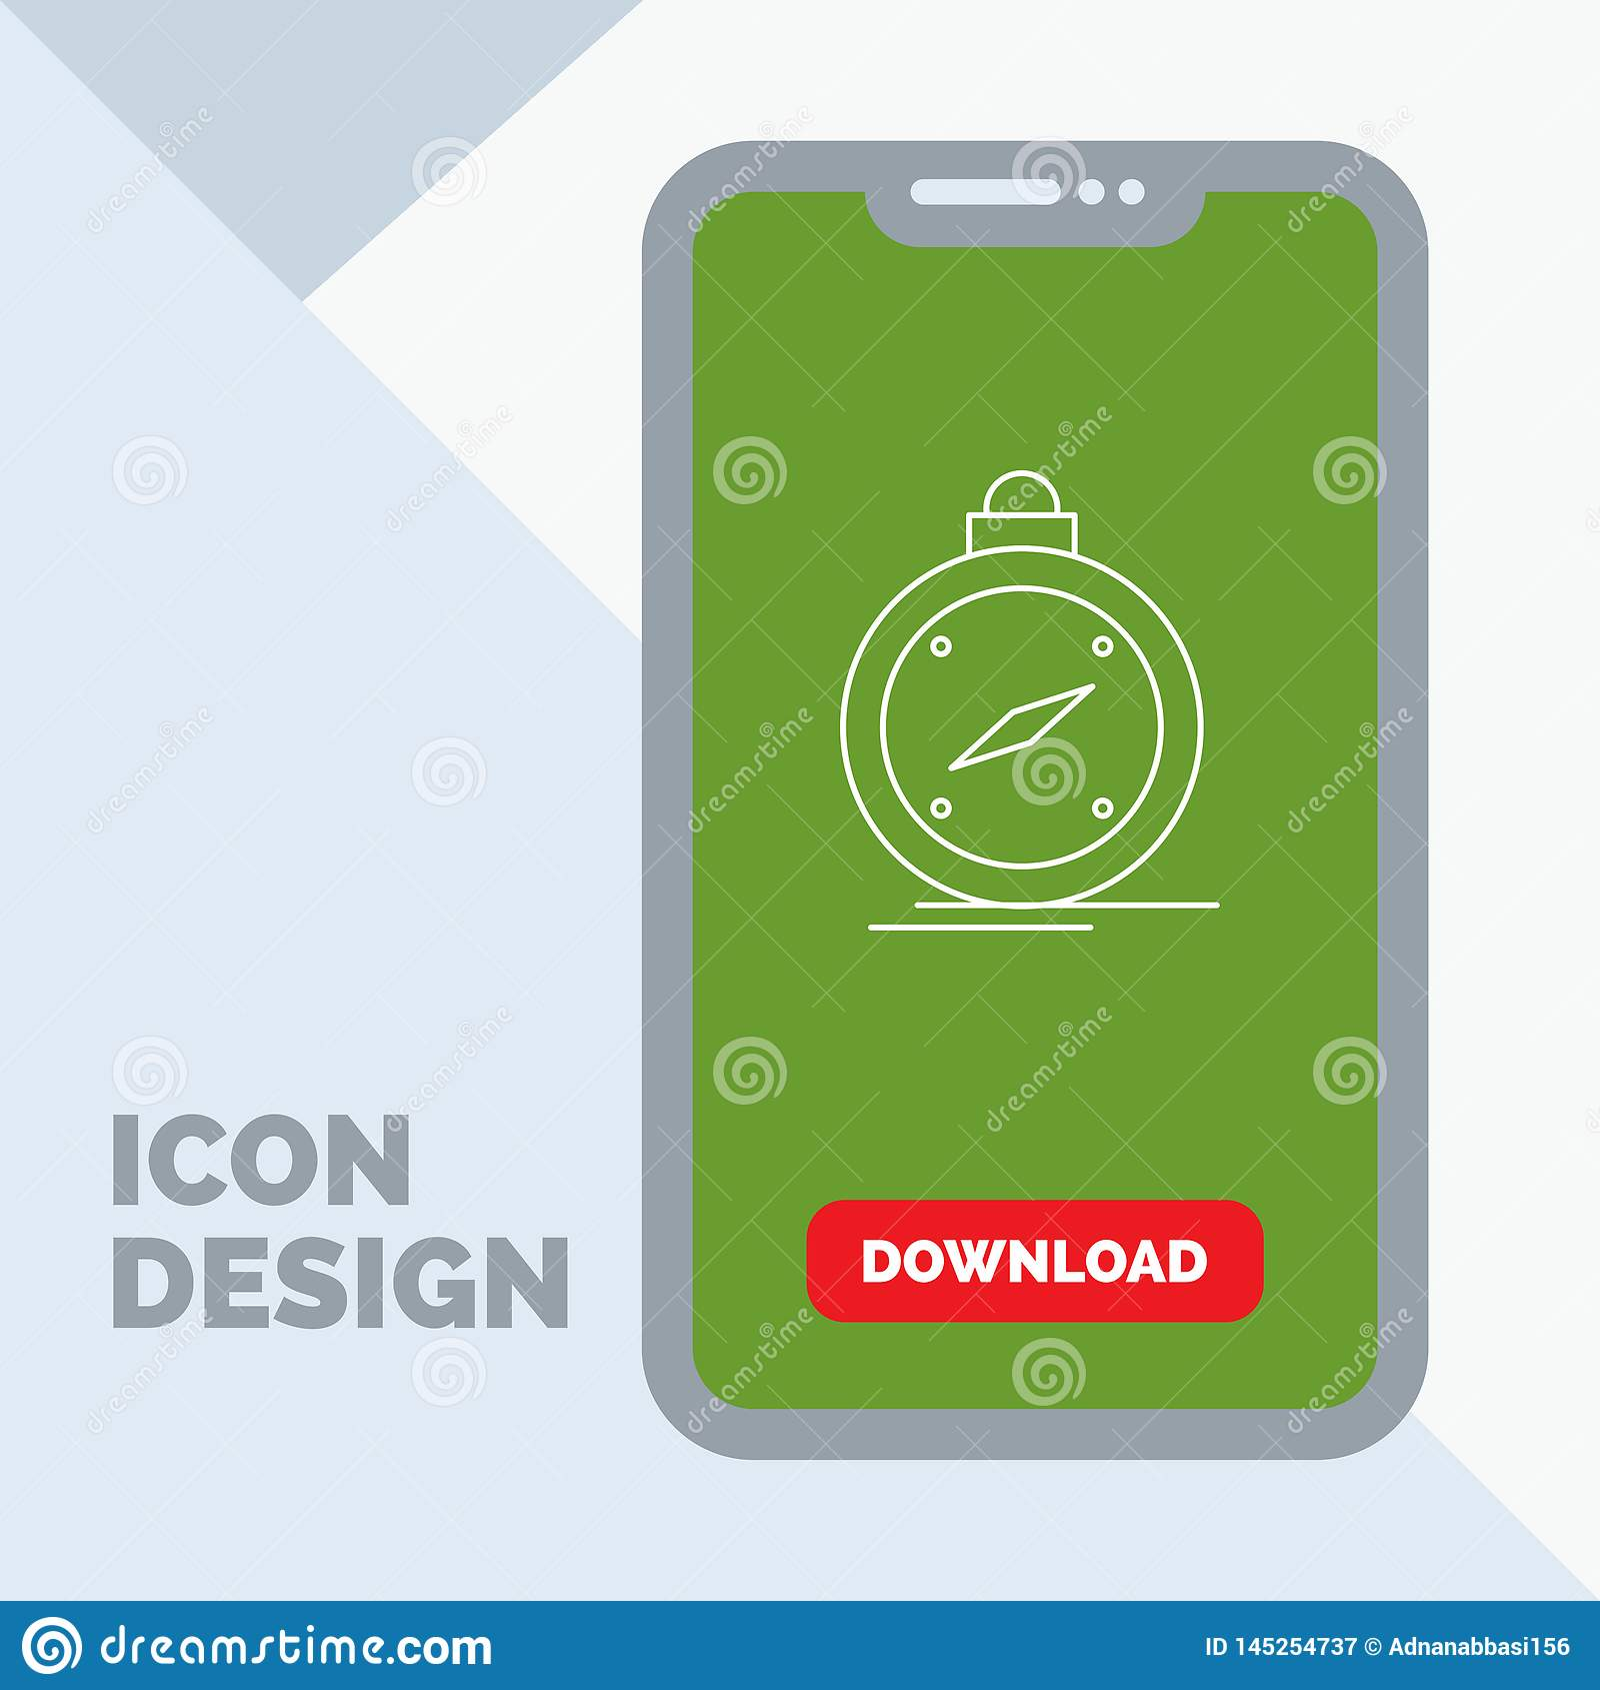 Compass mobile logo icon design royalty free vector image.